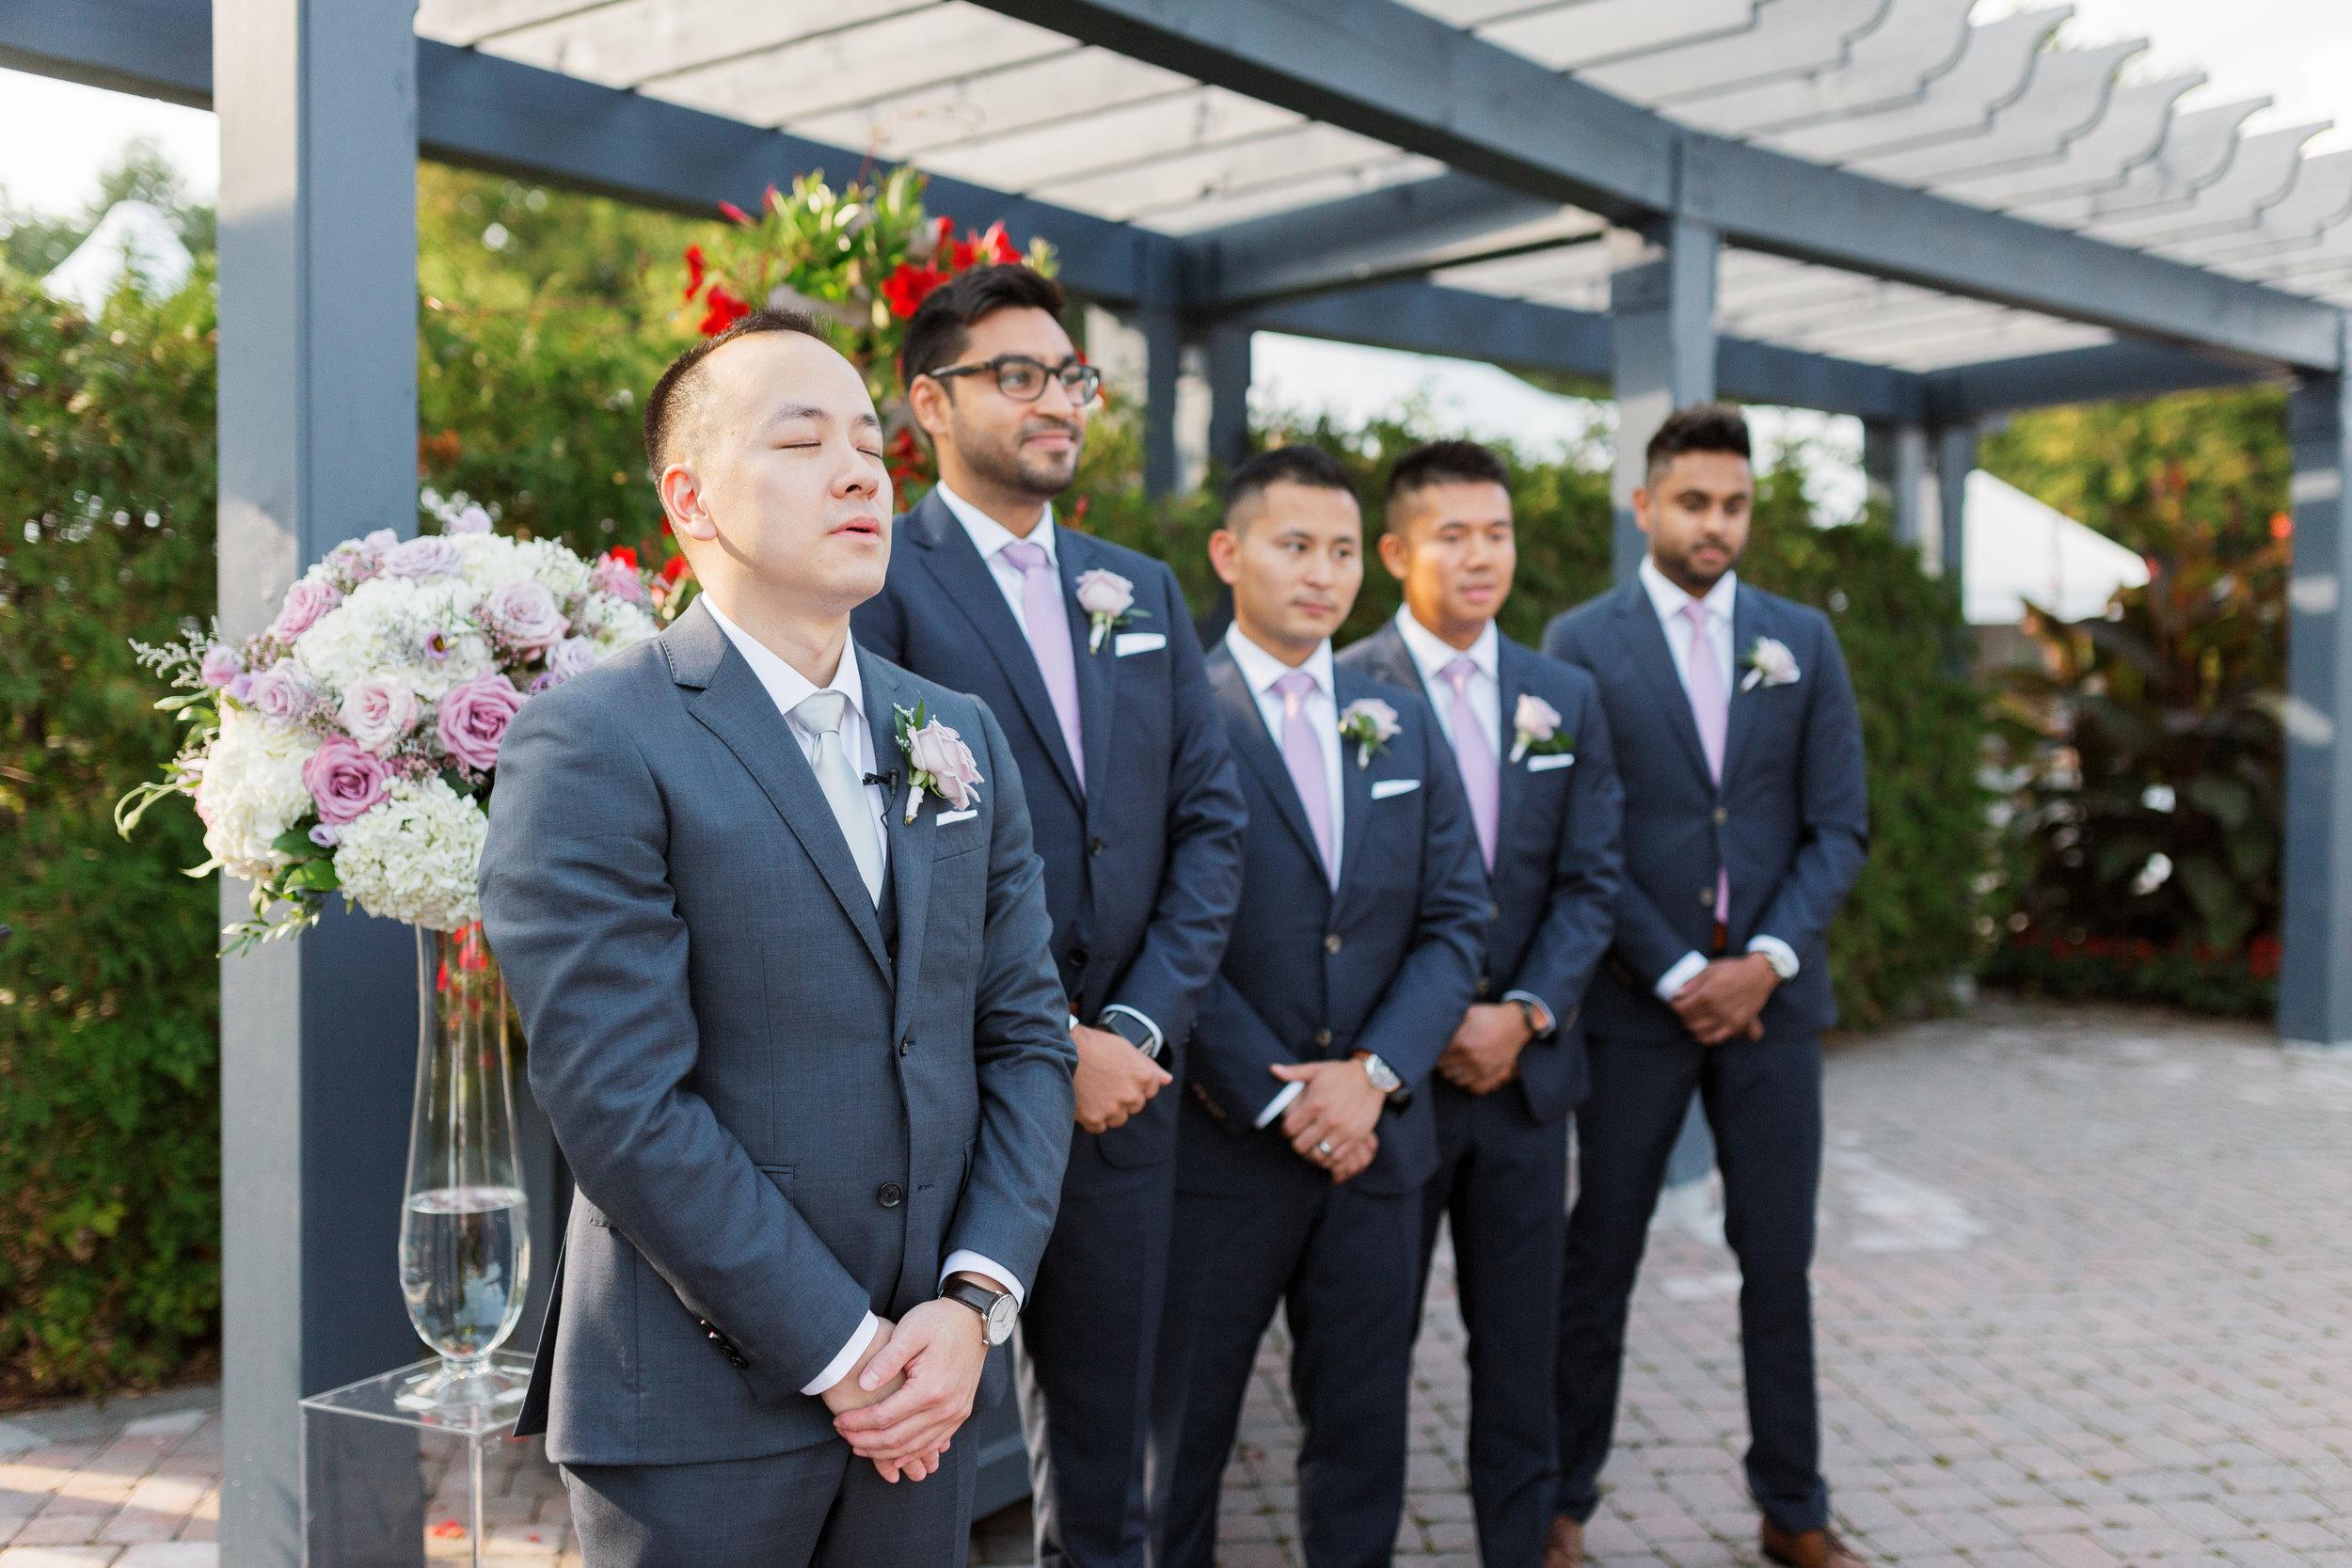 Angus Glen Wedding - Ceremony-24.jpg